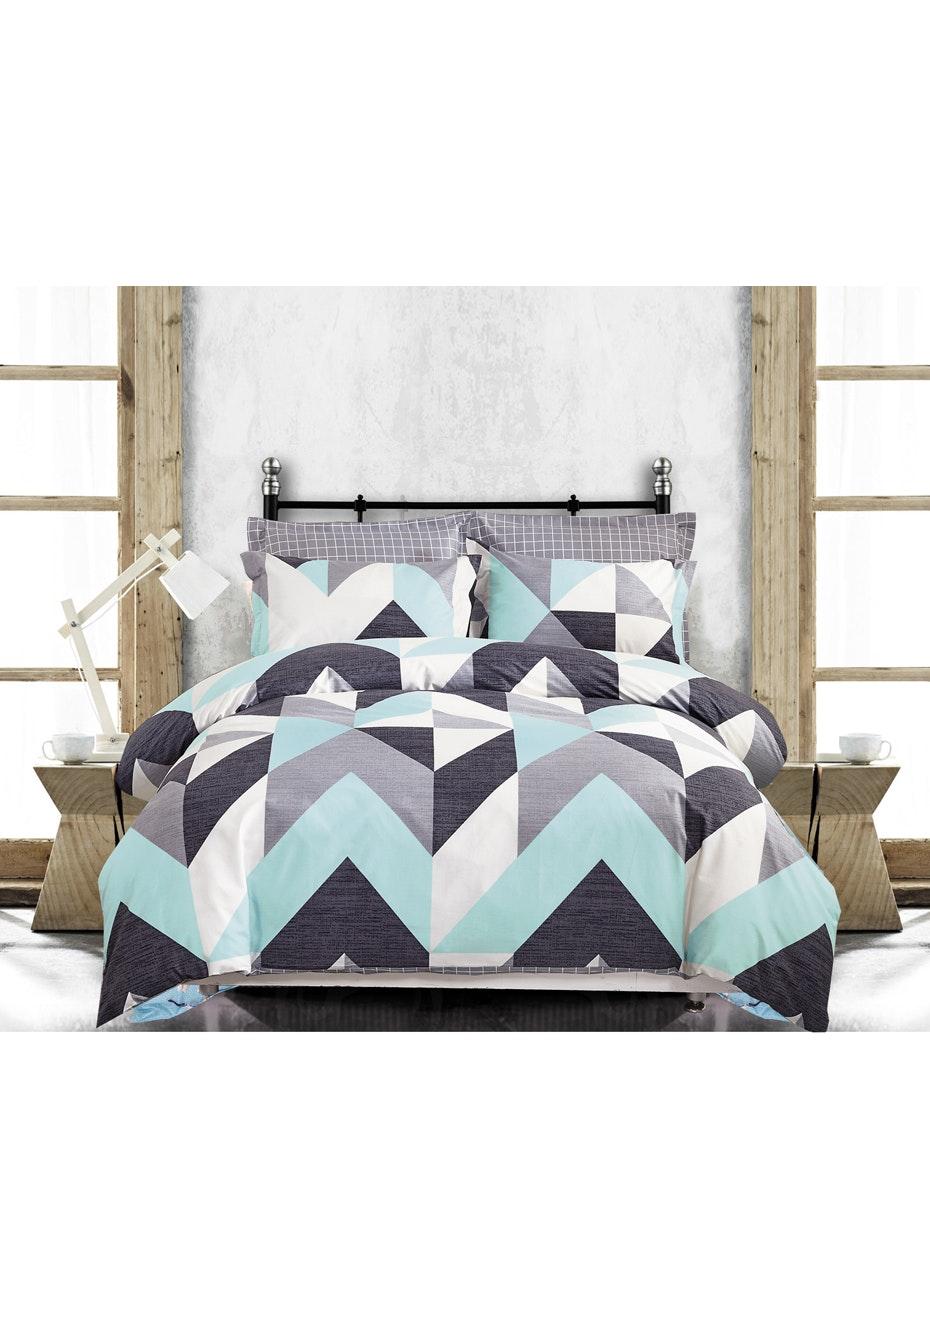 Coastline Quilt Cover Set - Reversible Design - 100% Cotton - King Bed